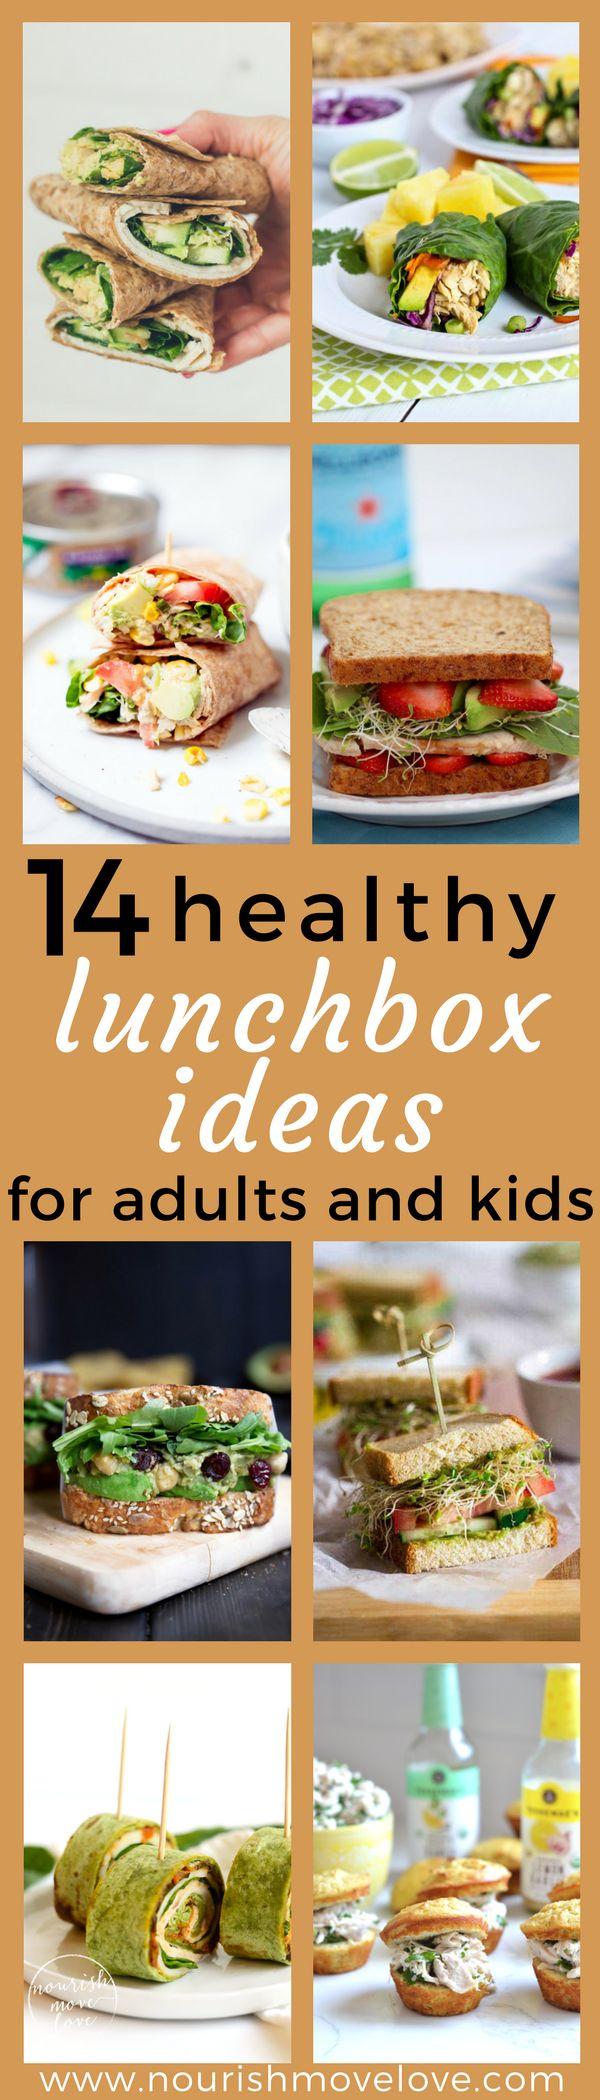 14 Healthy Lunch Box Ideas for Adults + Kids | www.nourishmovelove.com